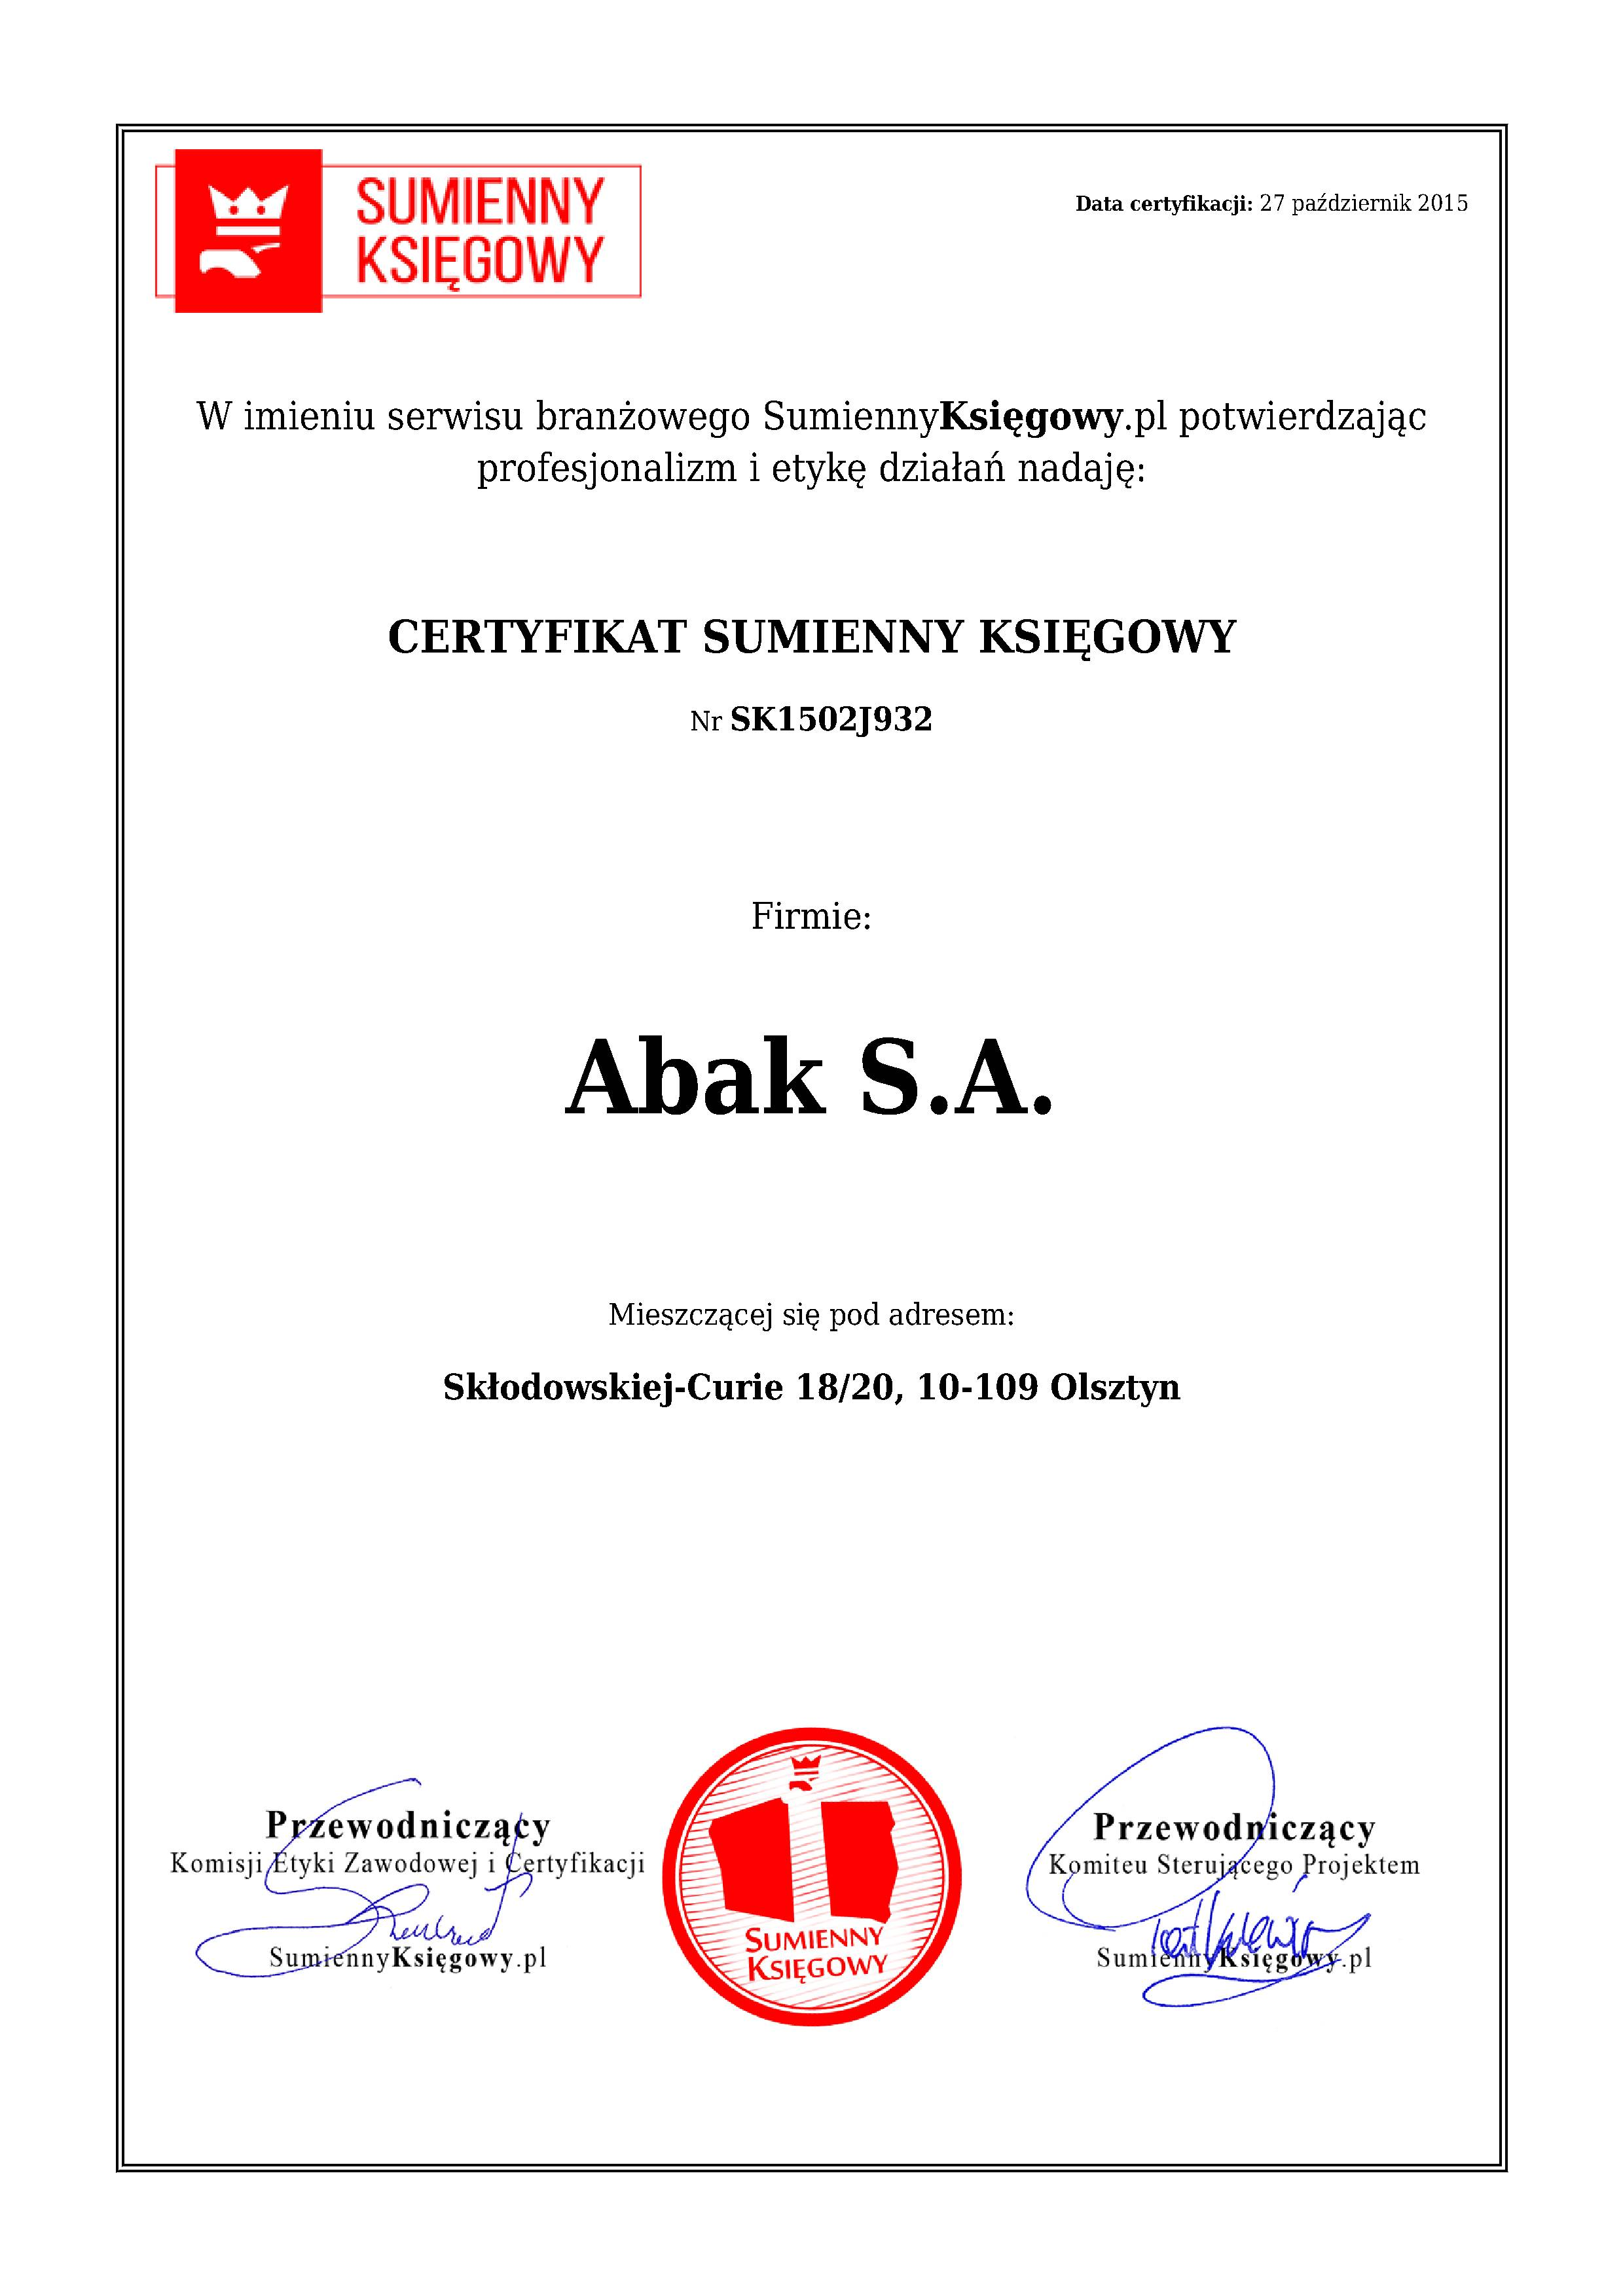 Certyfikat Abak S.A.